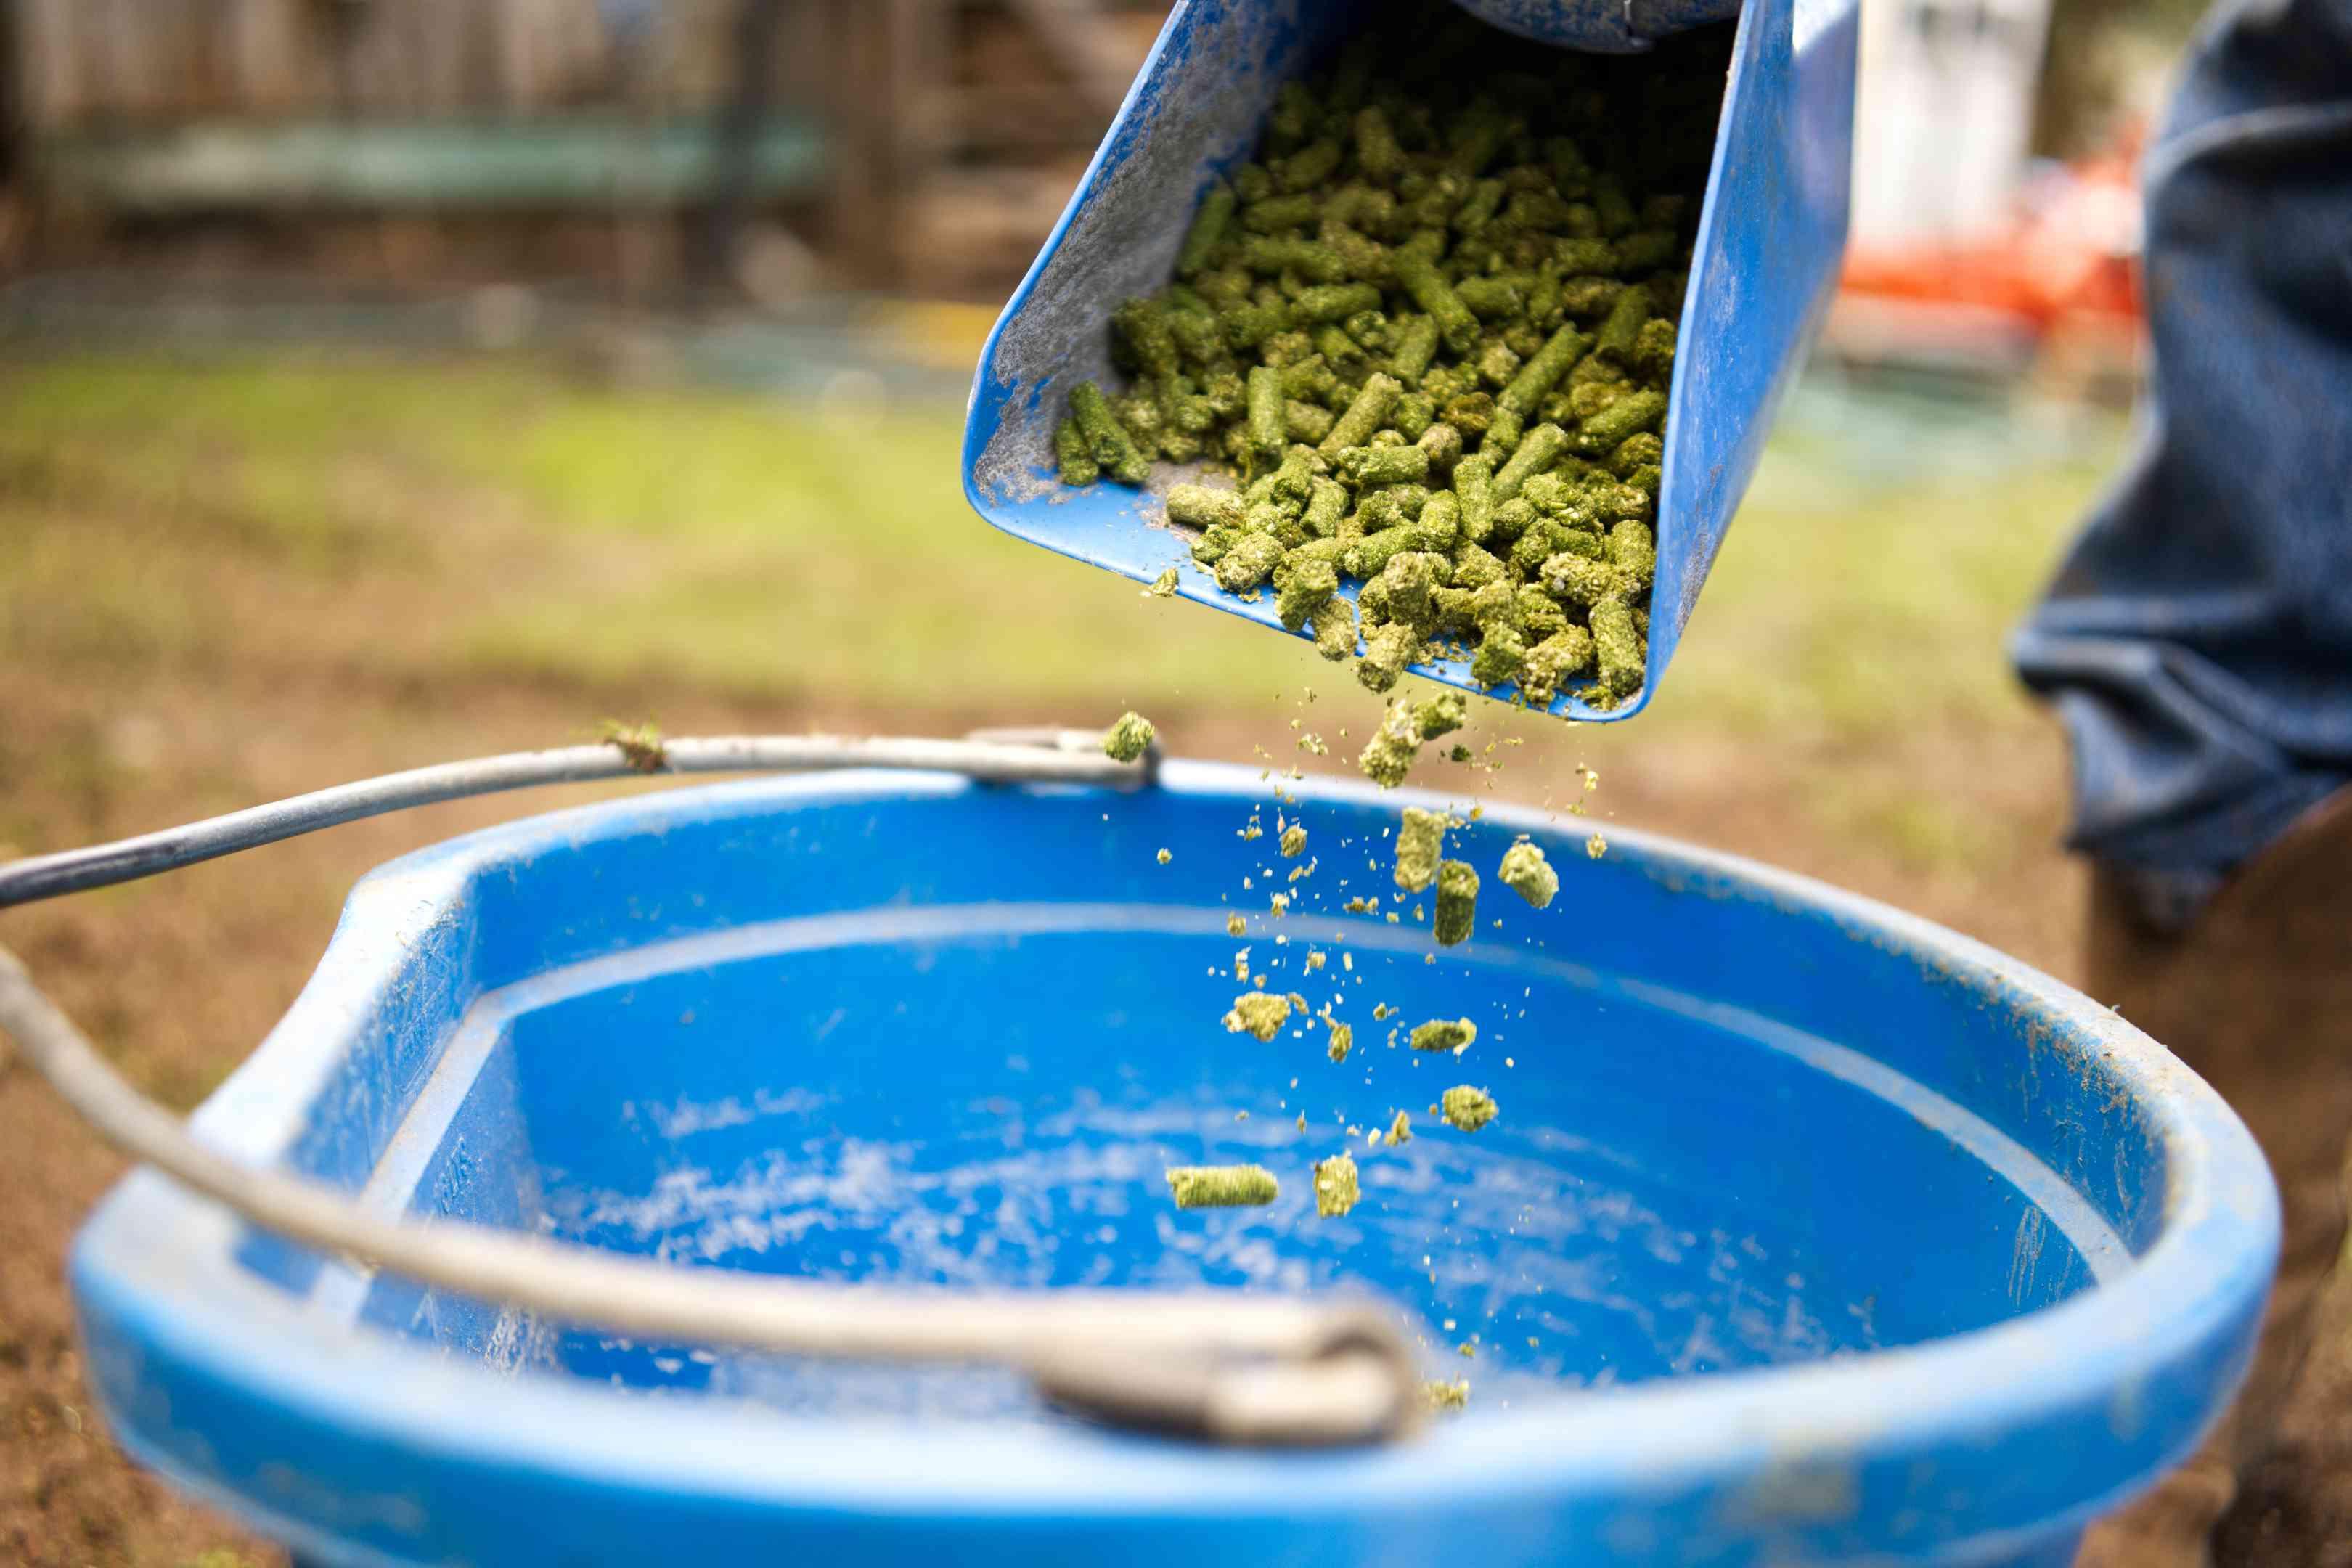 goat farmer dumps green food pellets into blue plastic bucket for feeding